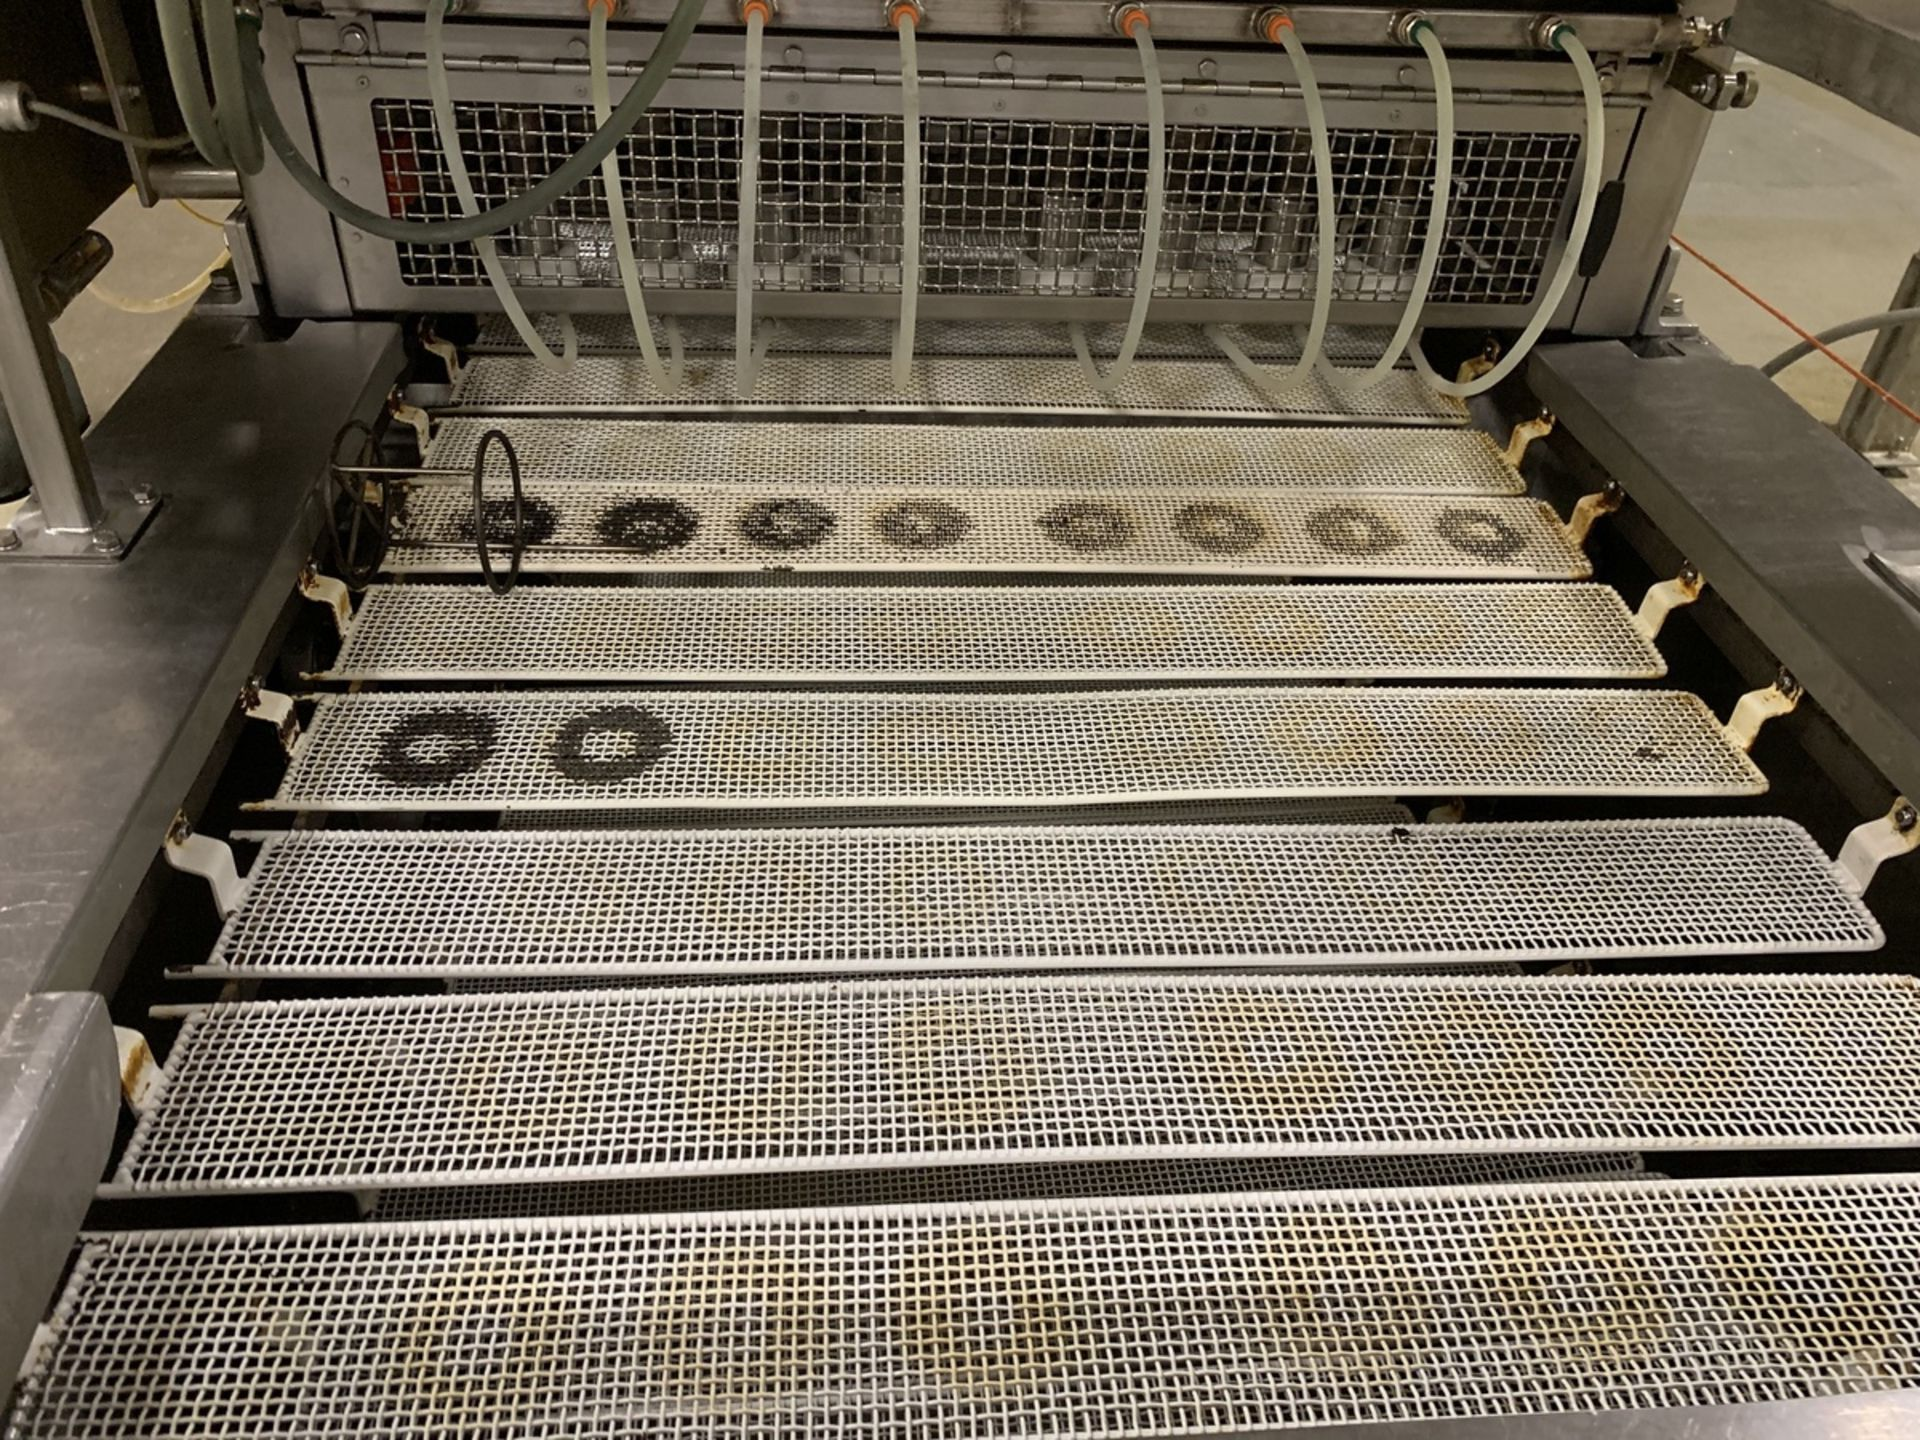 "Lot 15 - Moline 8-Up Donut Proofing Line Model D12-8, 35"" Belt Width, 4.5 | Subject to Bulk | Rig Fee: 6250"